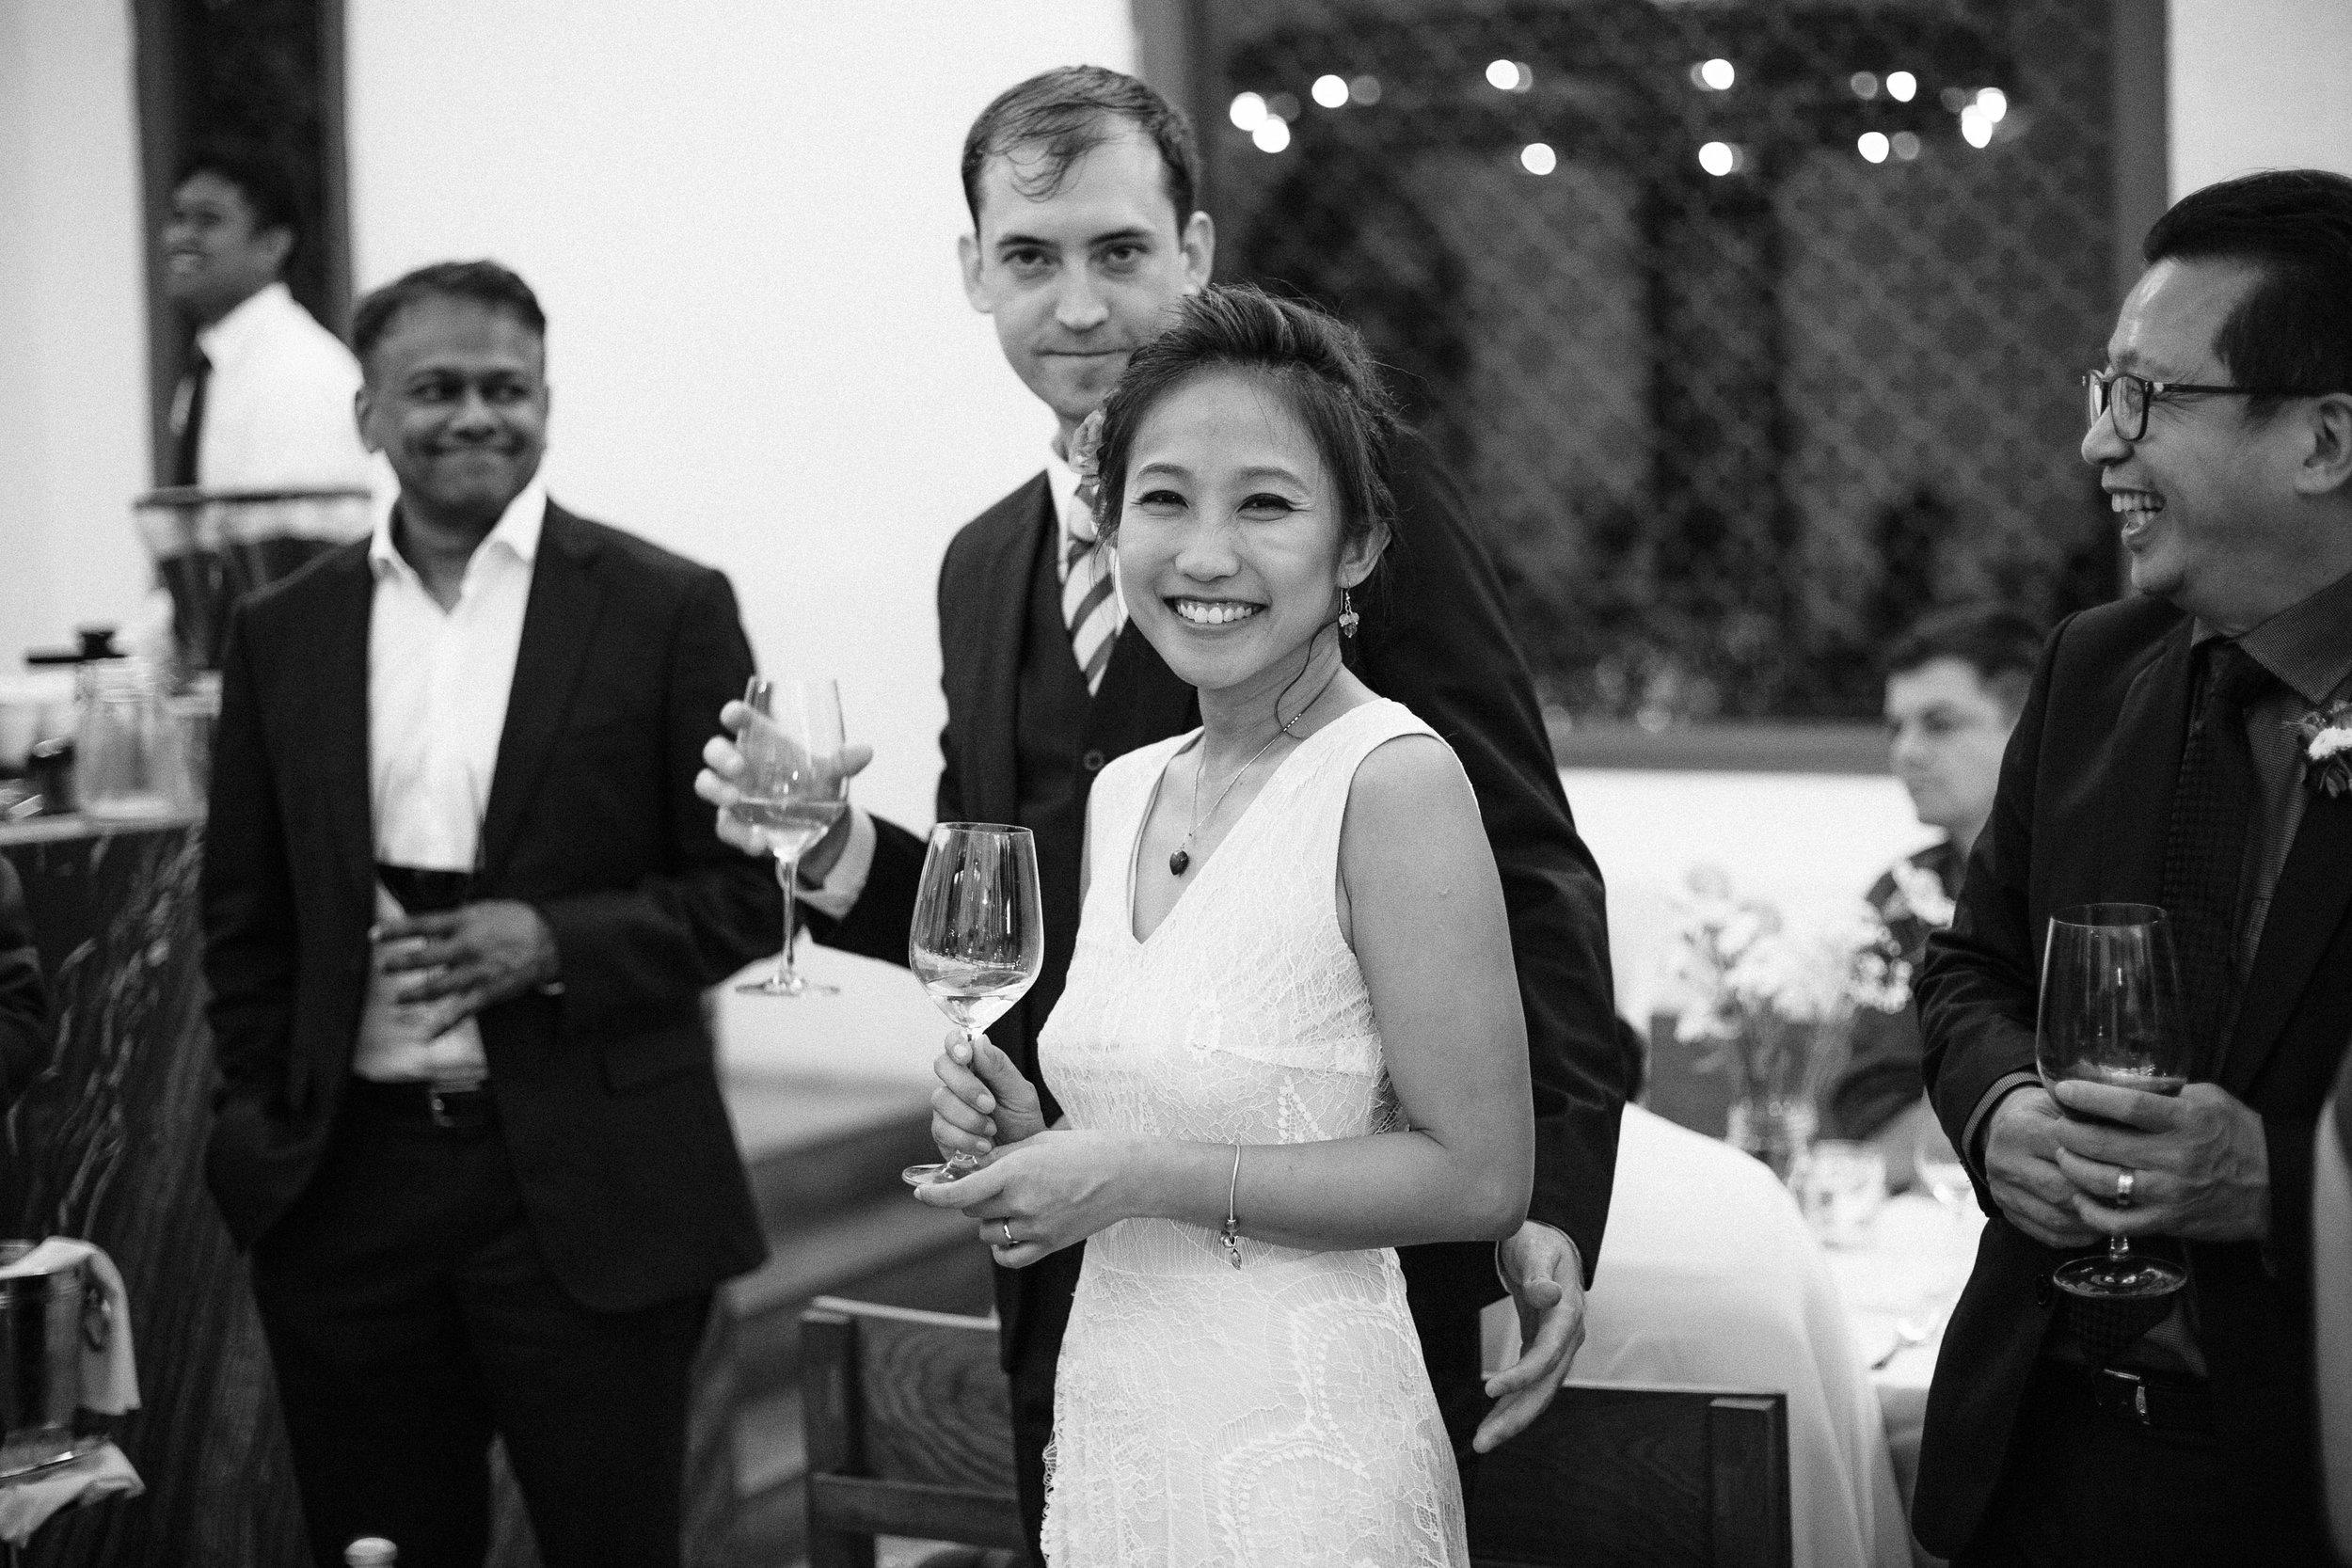 singapore-wedding-photographer-hiram-joyce-073.jpg